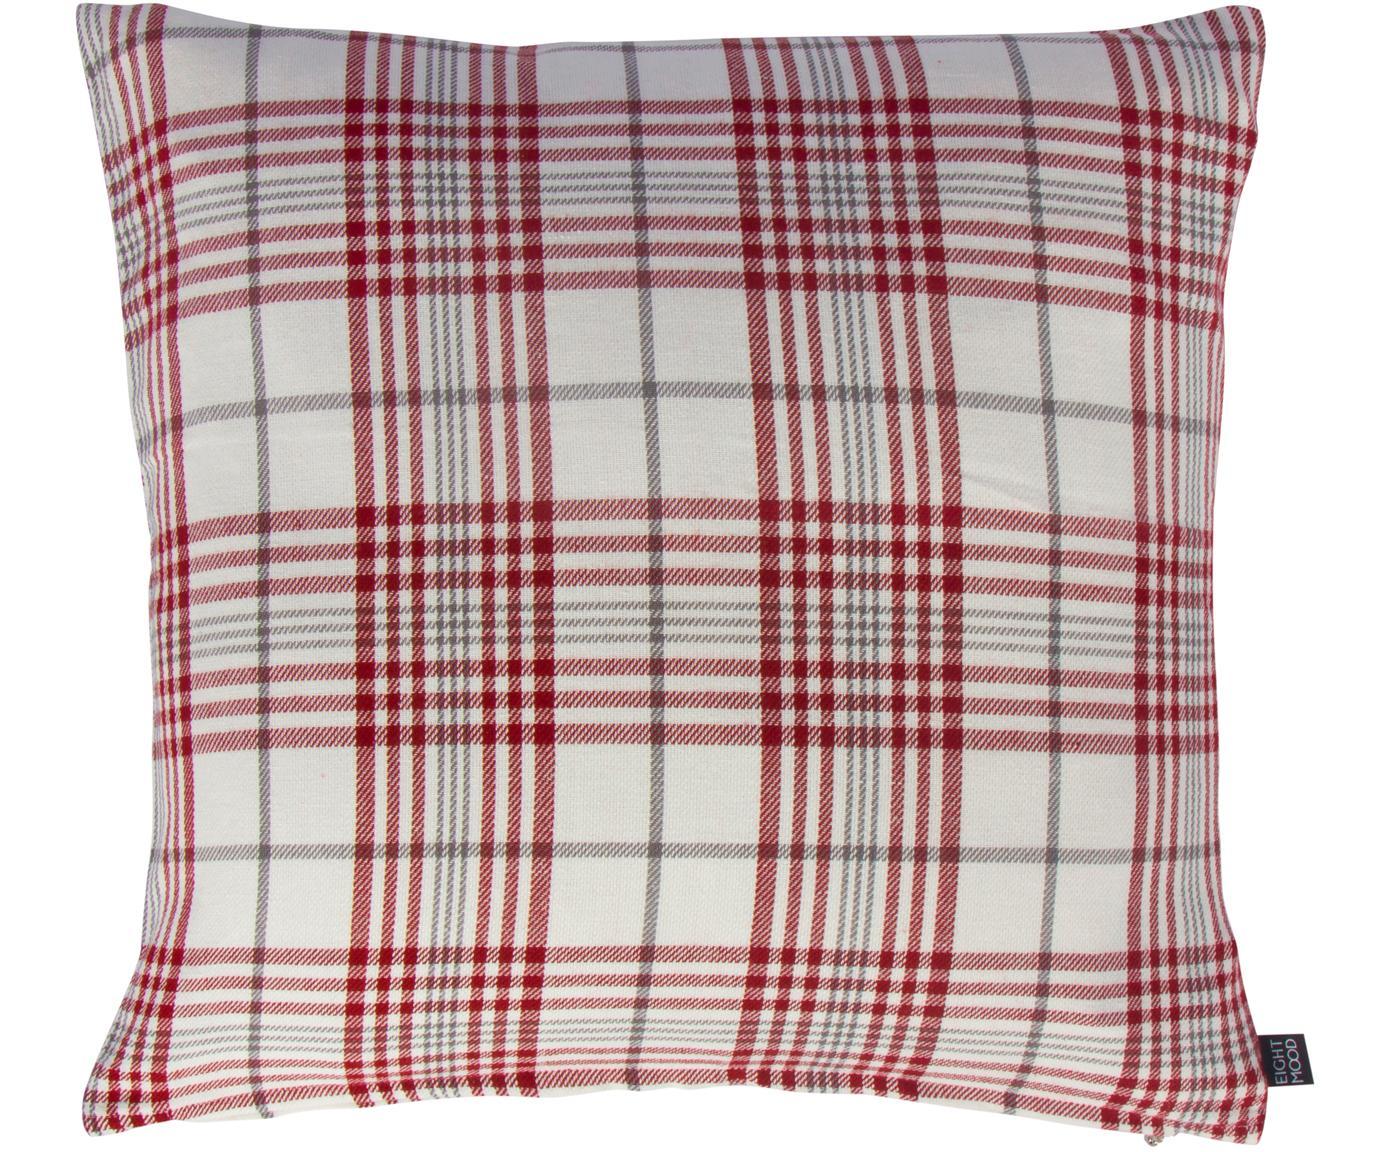 Cojín Siv, con relleno, Funda: algodón, Rojo, beige, gris antracita, An 50 x L 50 cm